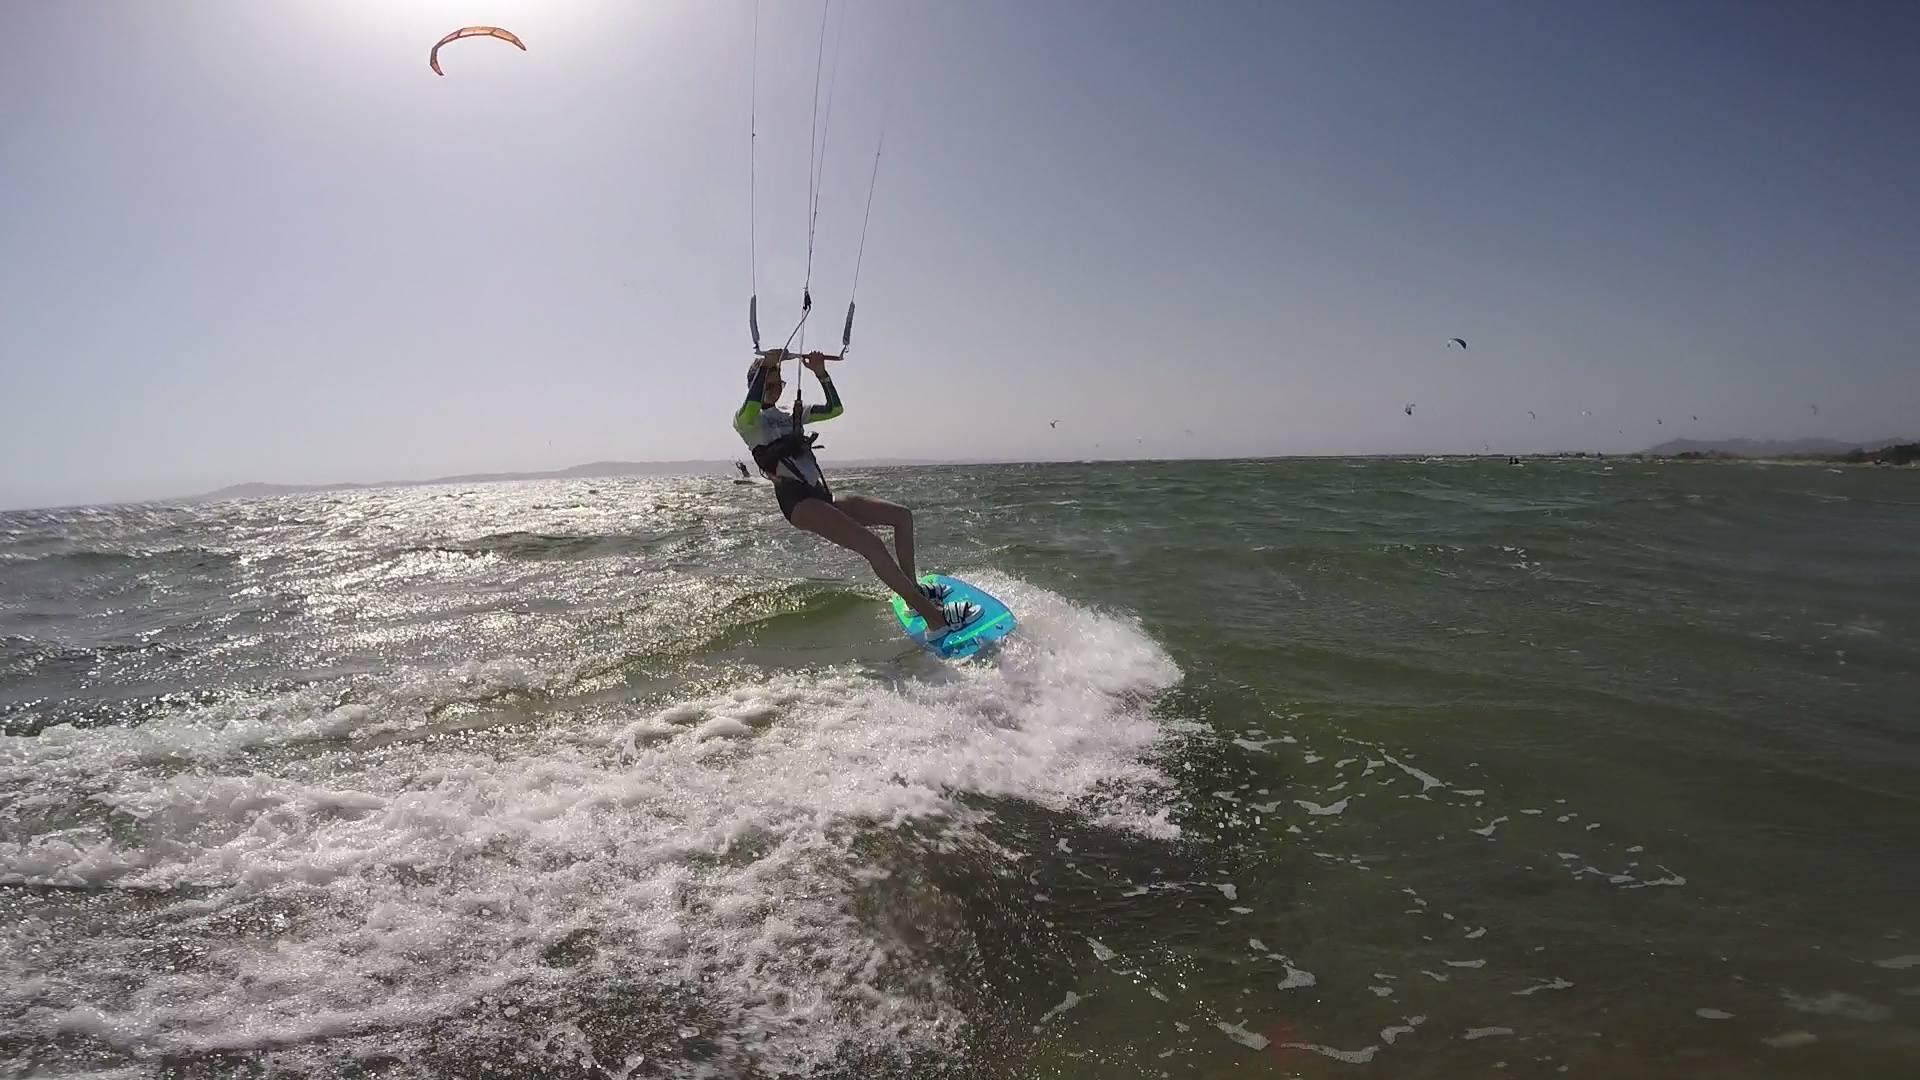 Kitesurfen Porto Botte, Sardinien: Kiten Lernen in Porto Botte auf Sardinien